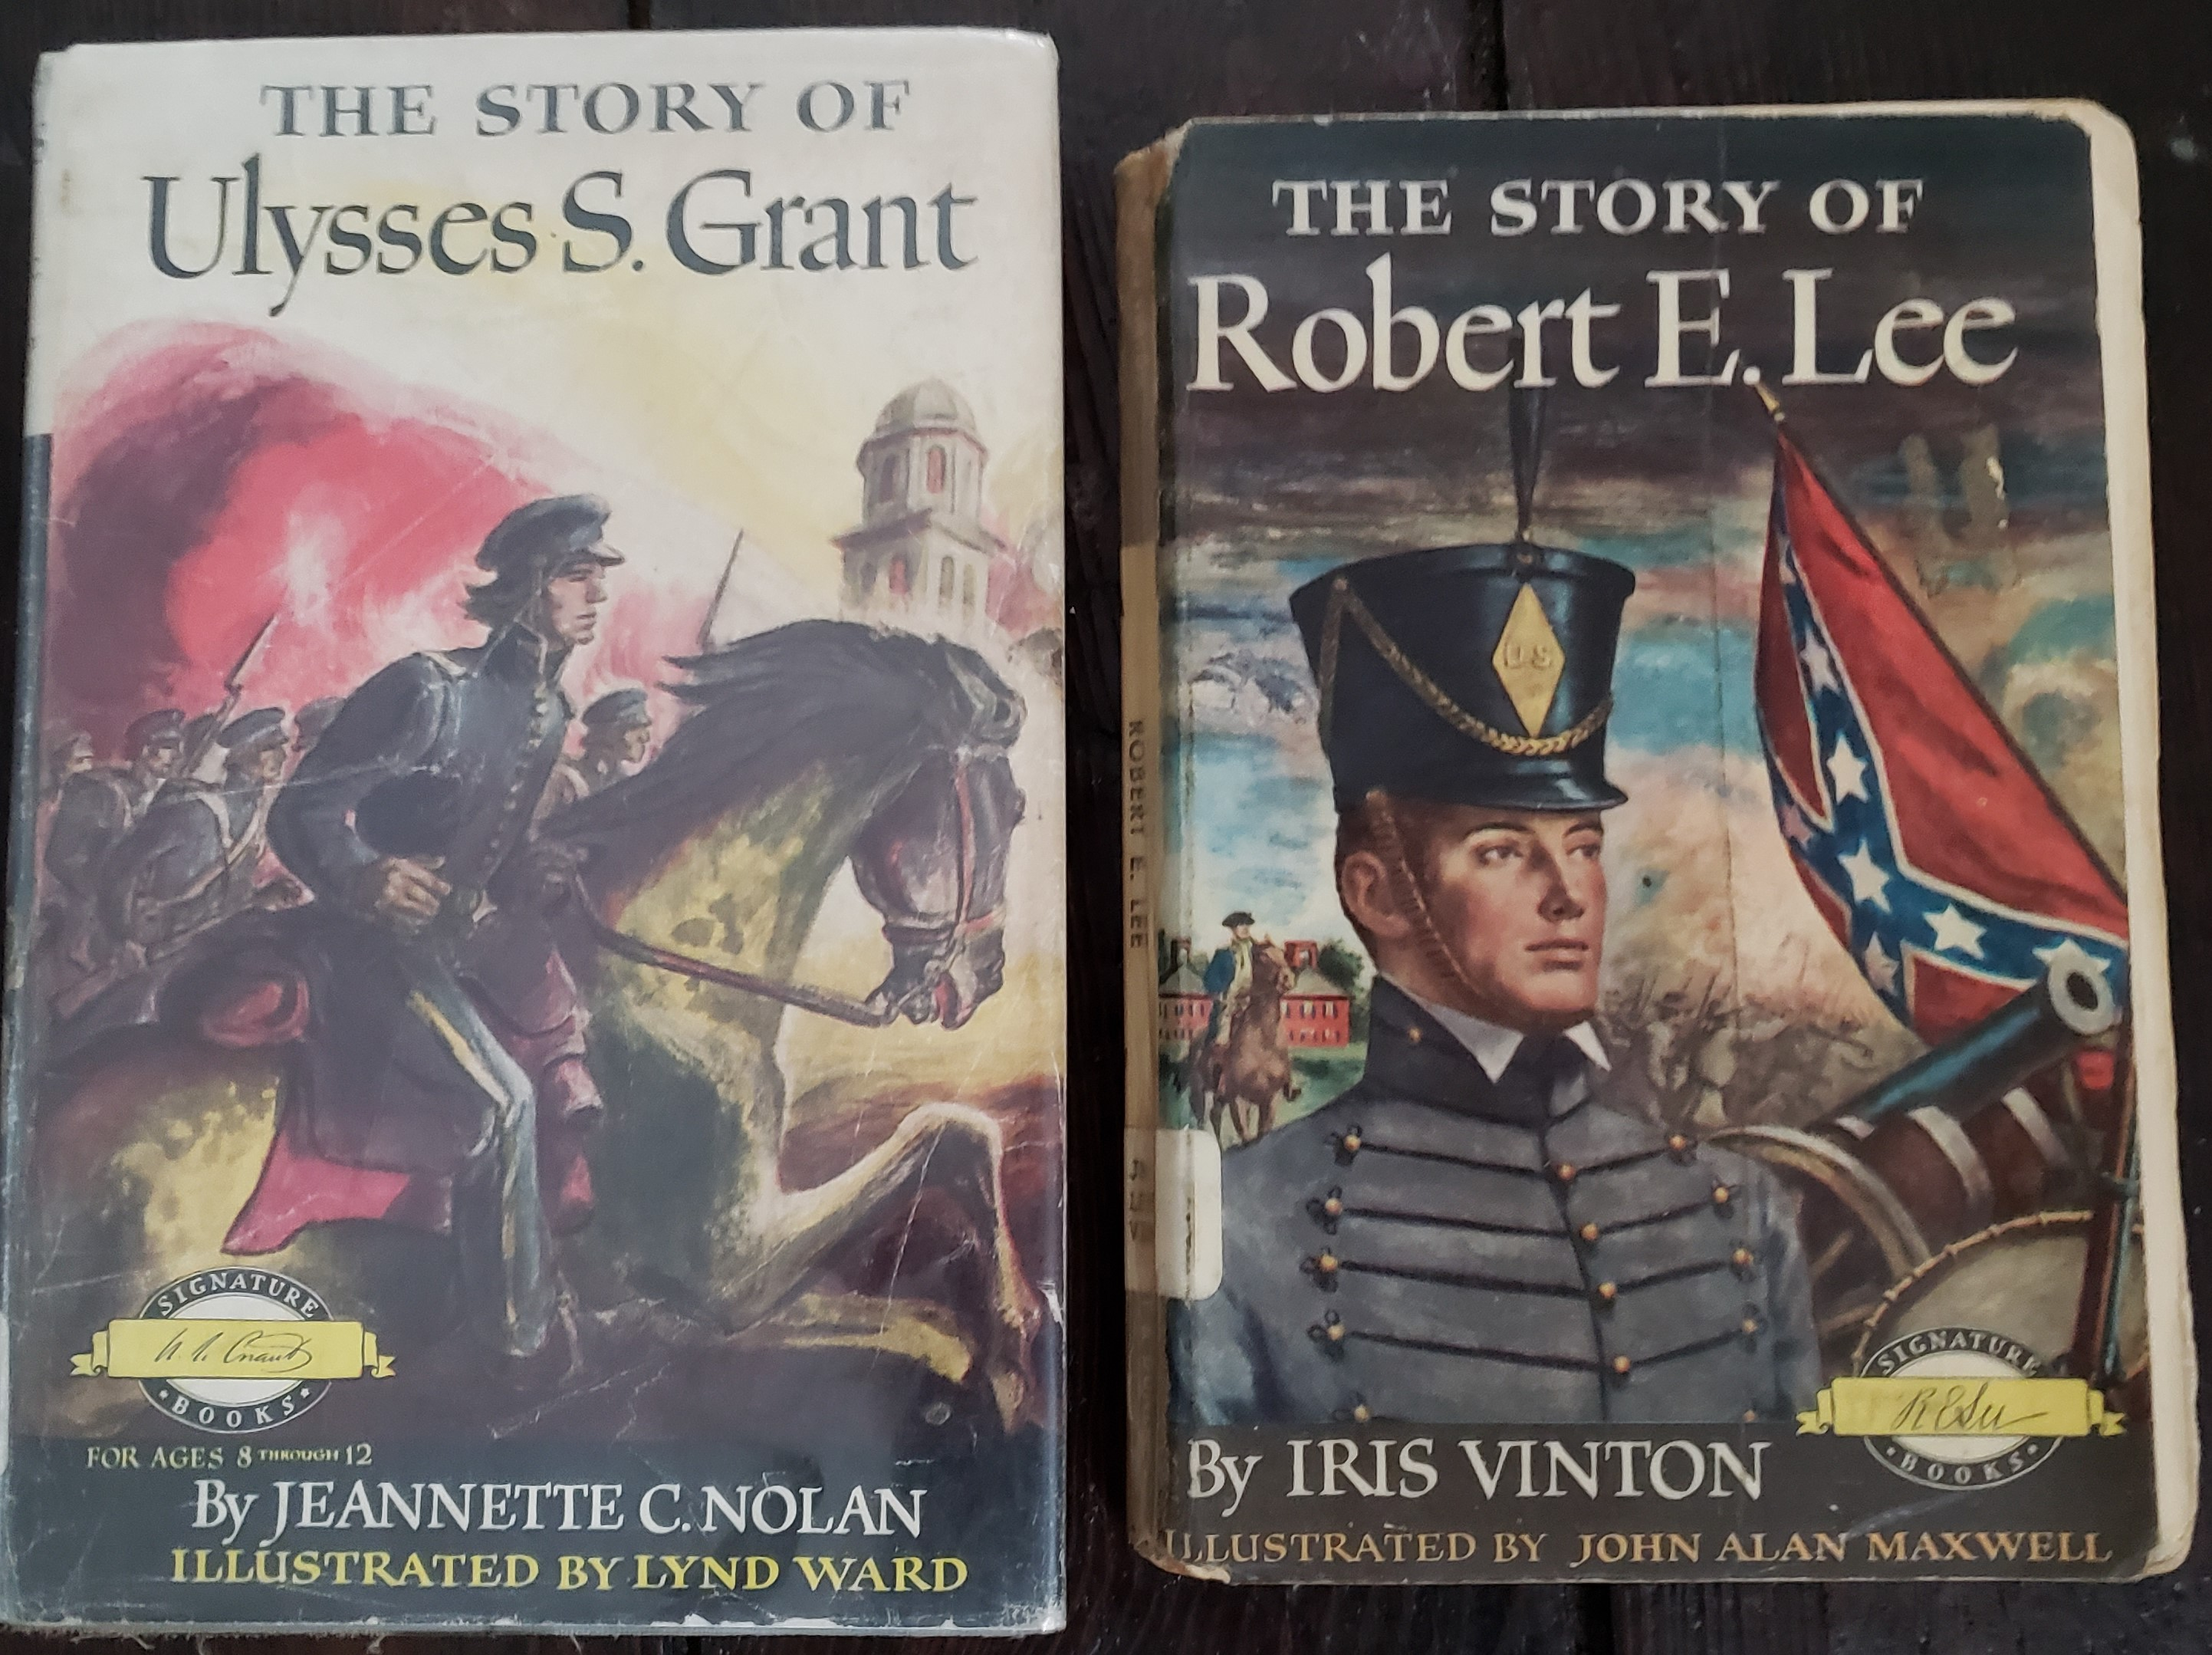 1995 books